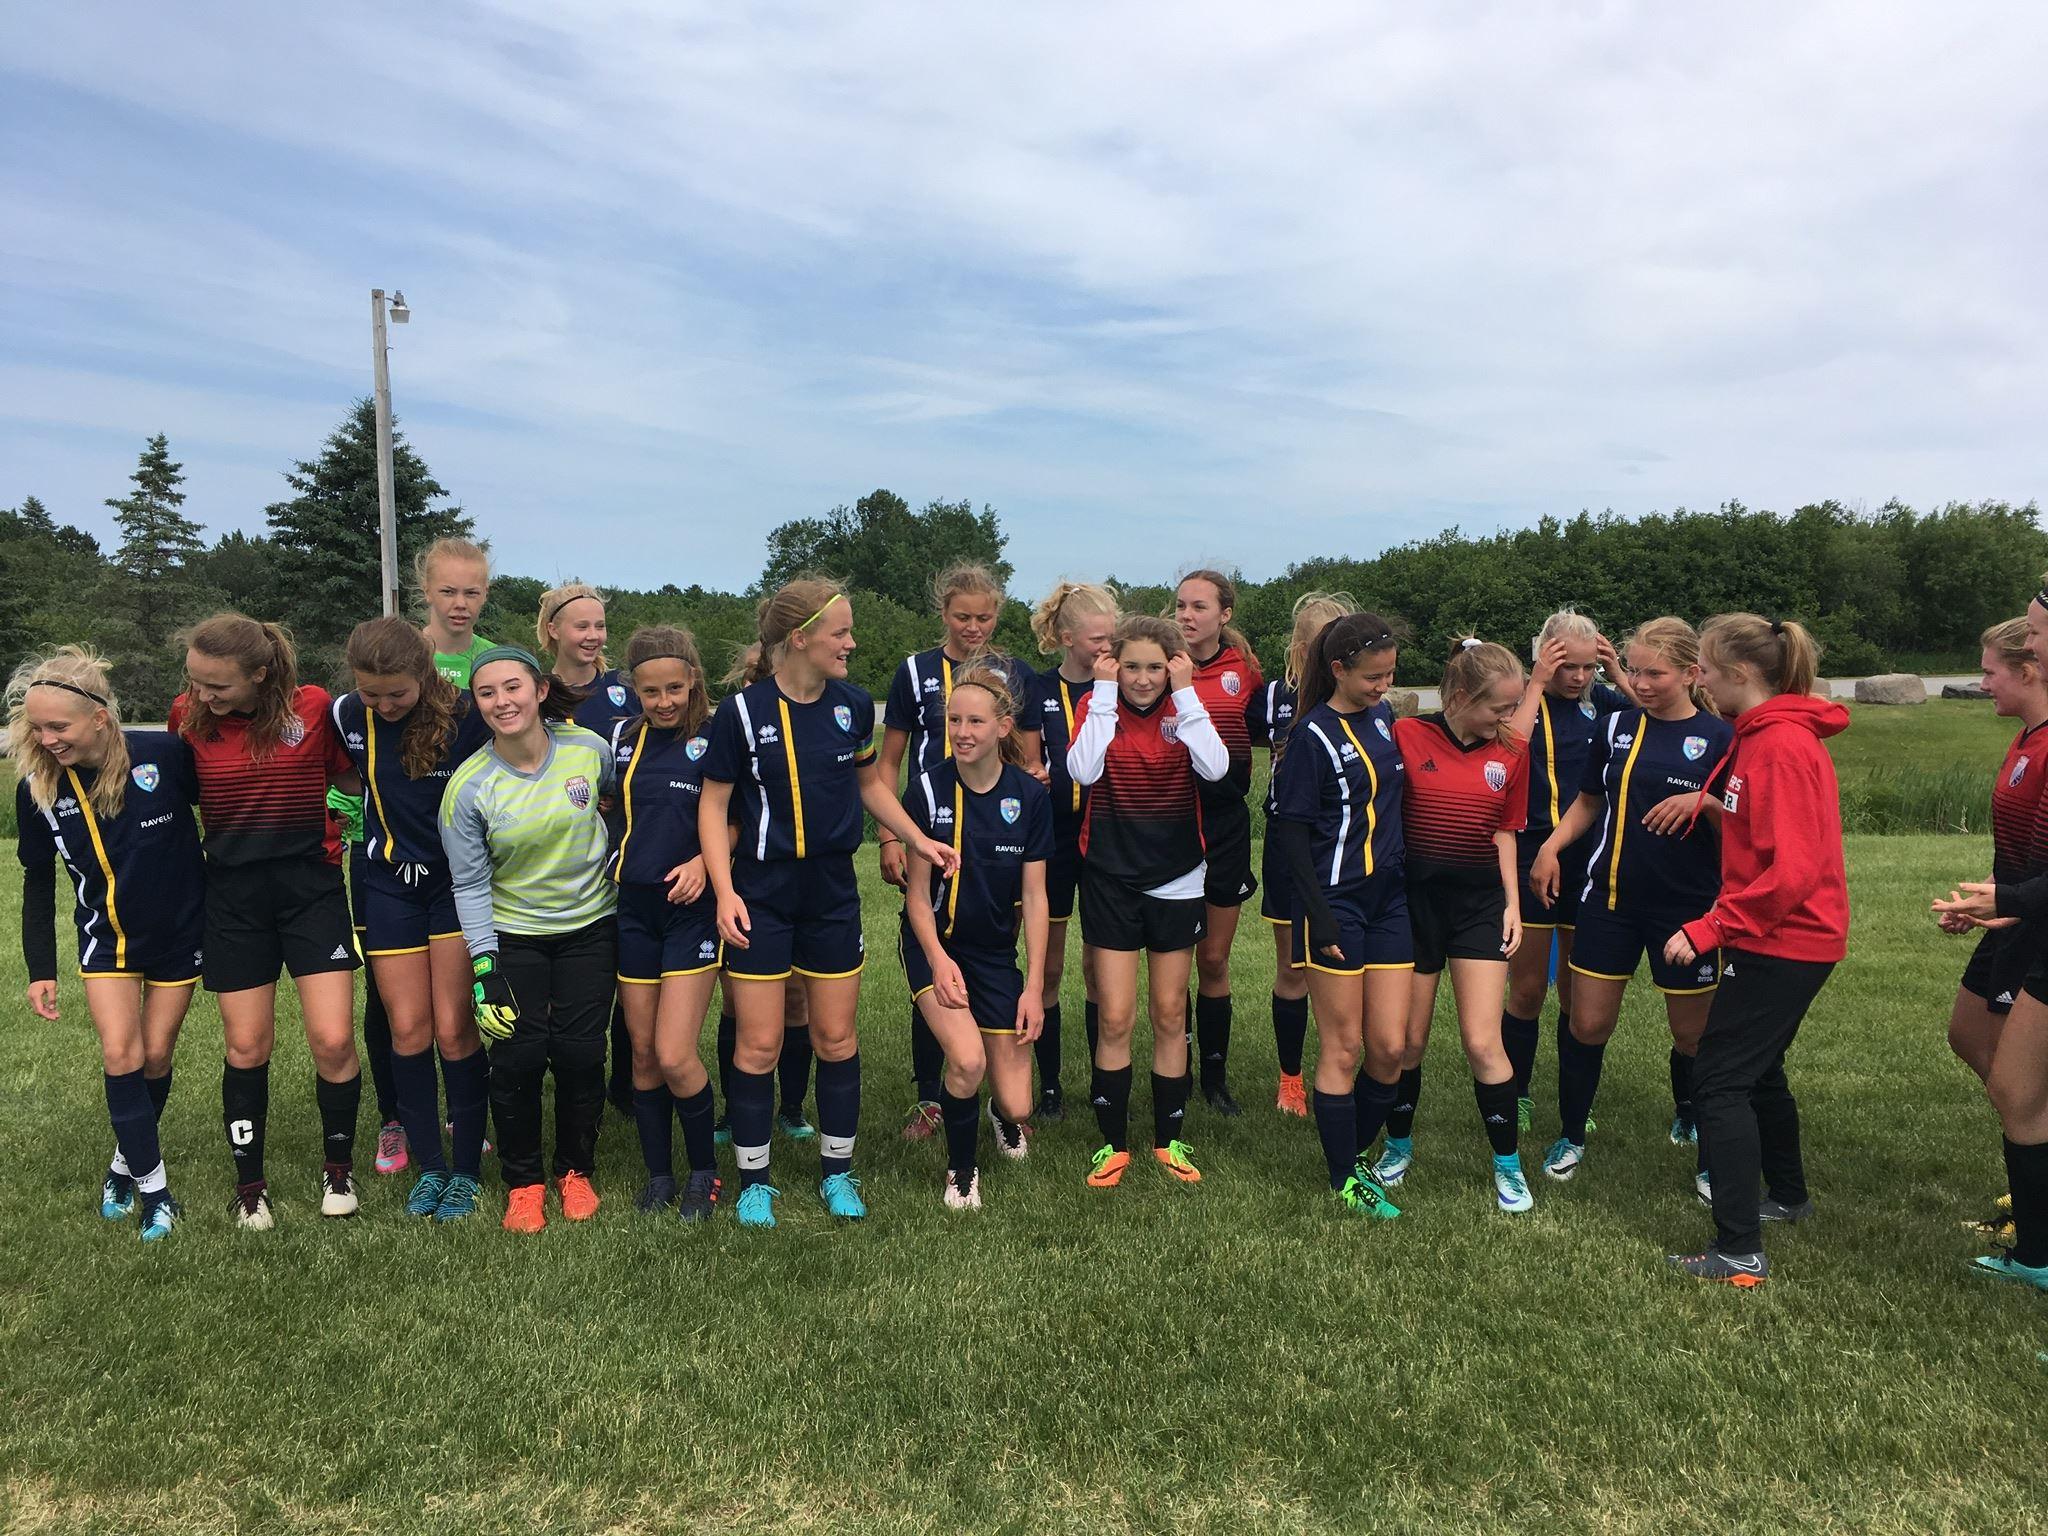 Fotboll: Sister City Soccer Cup 2019